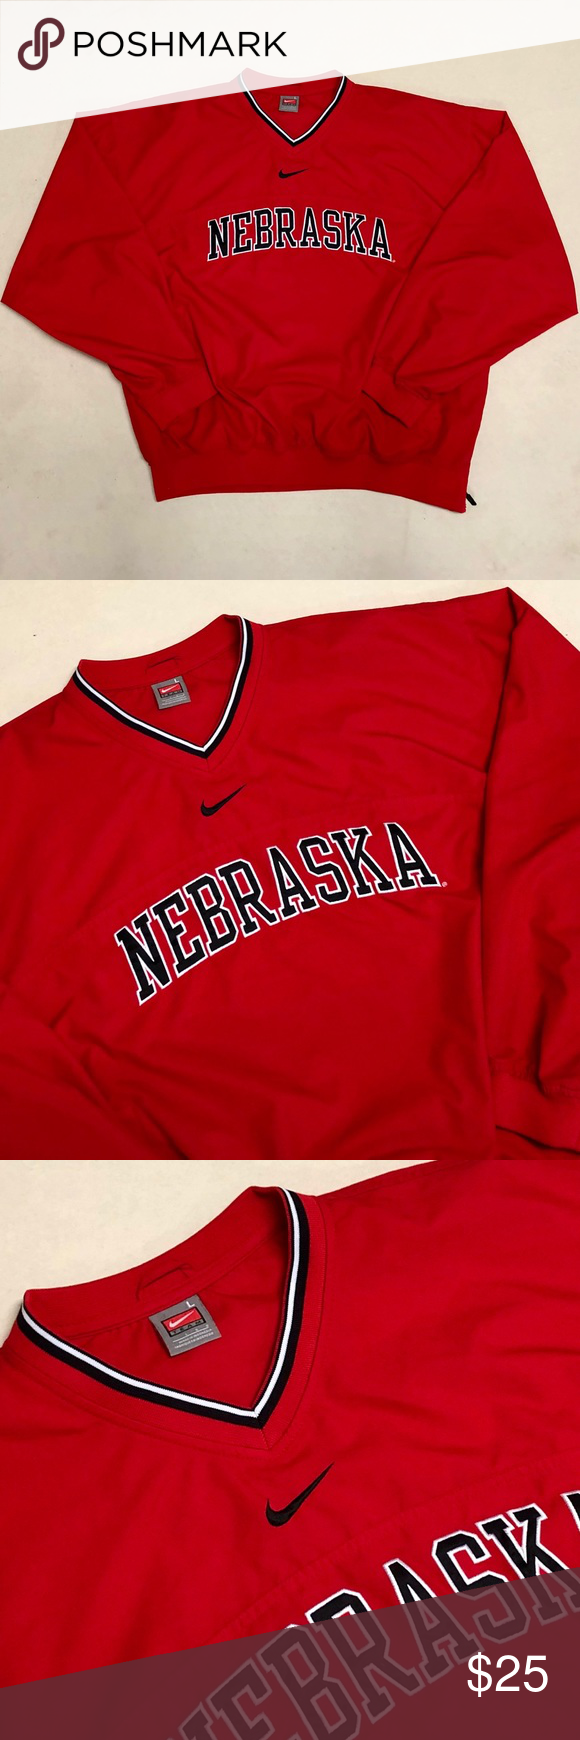 Obligar Parlamento dígito  University of Nebraska - Nike Men's Pullover in 2020 | Nike men, Nike  pullover, Pullover men